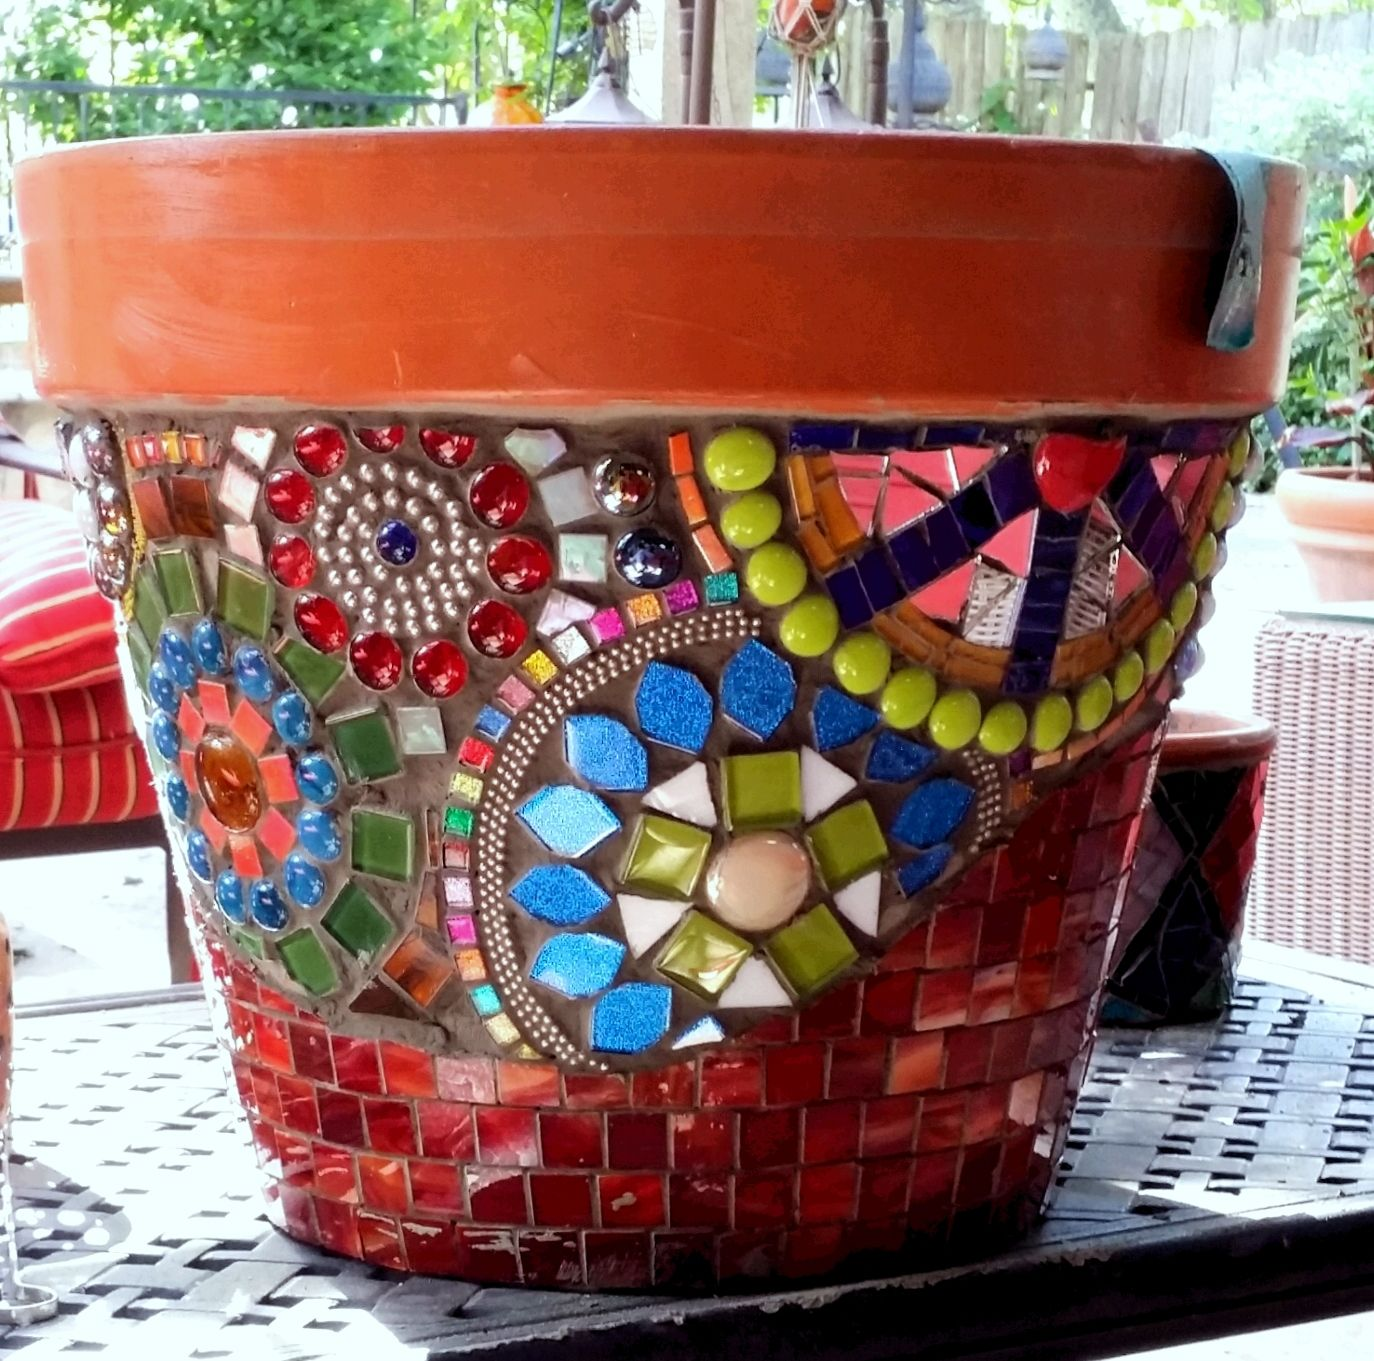 Mosaic Pot By Courtney 2014, For My Meyer Lemon Tree! Side